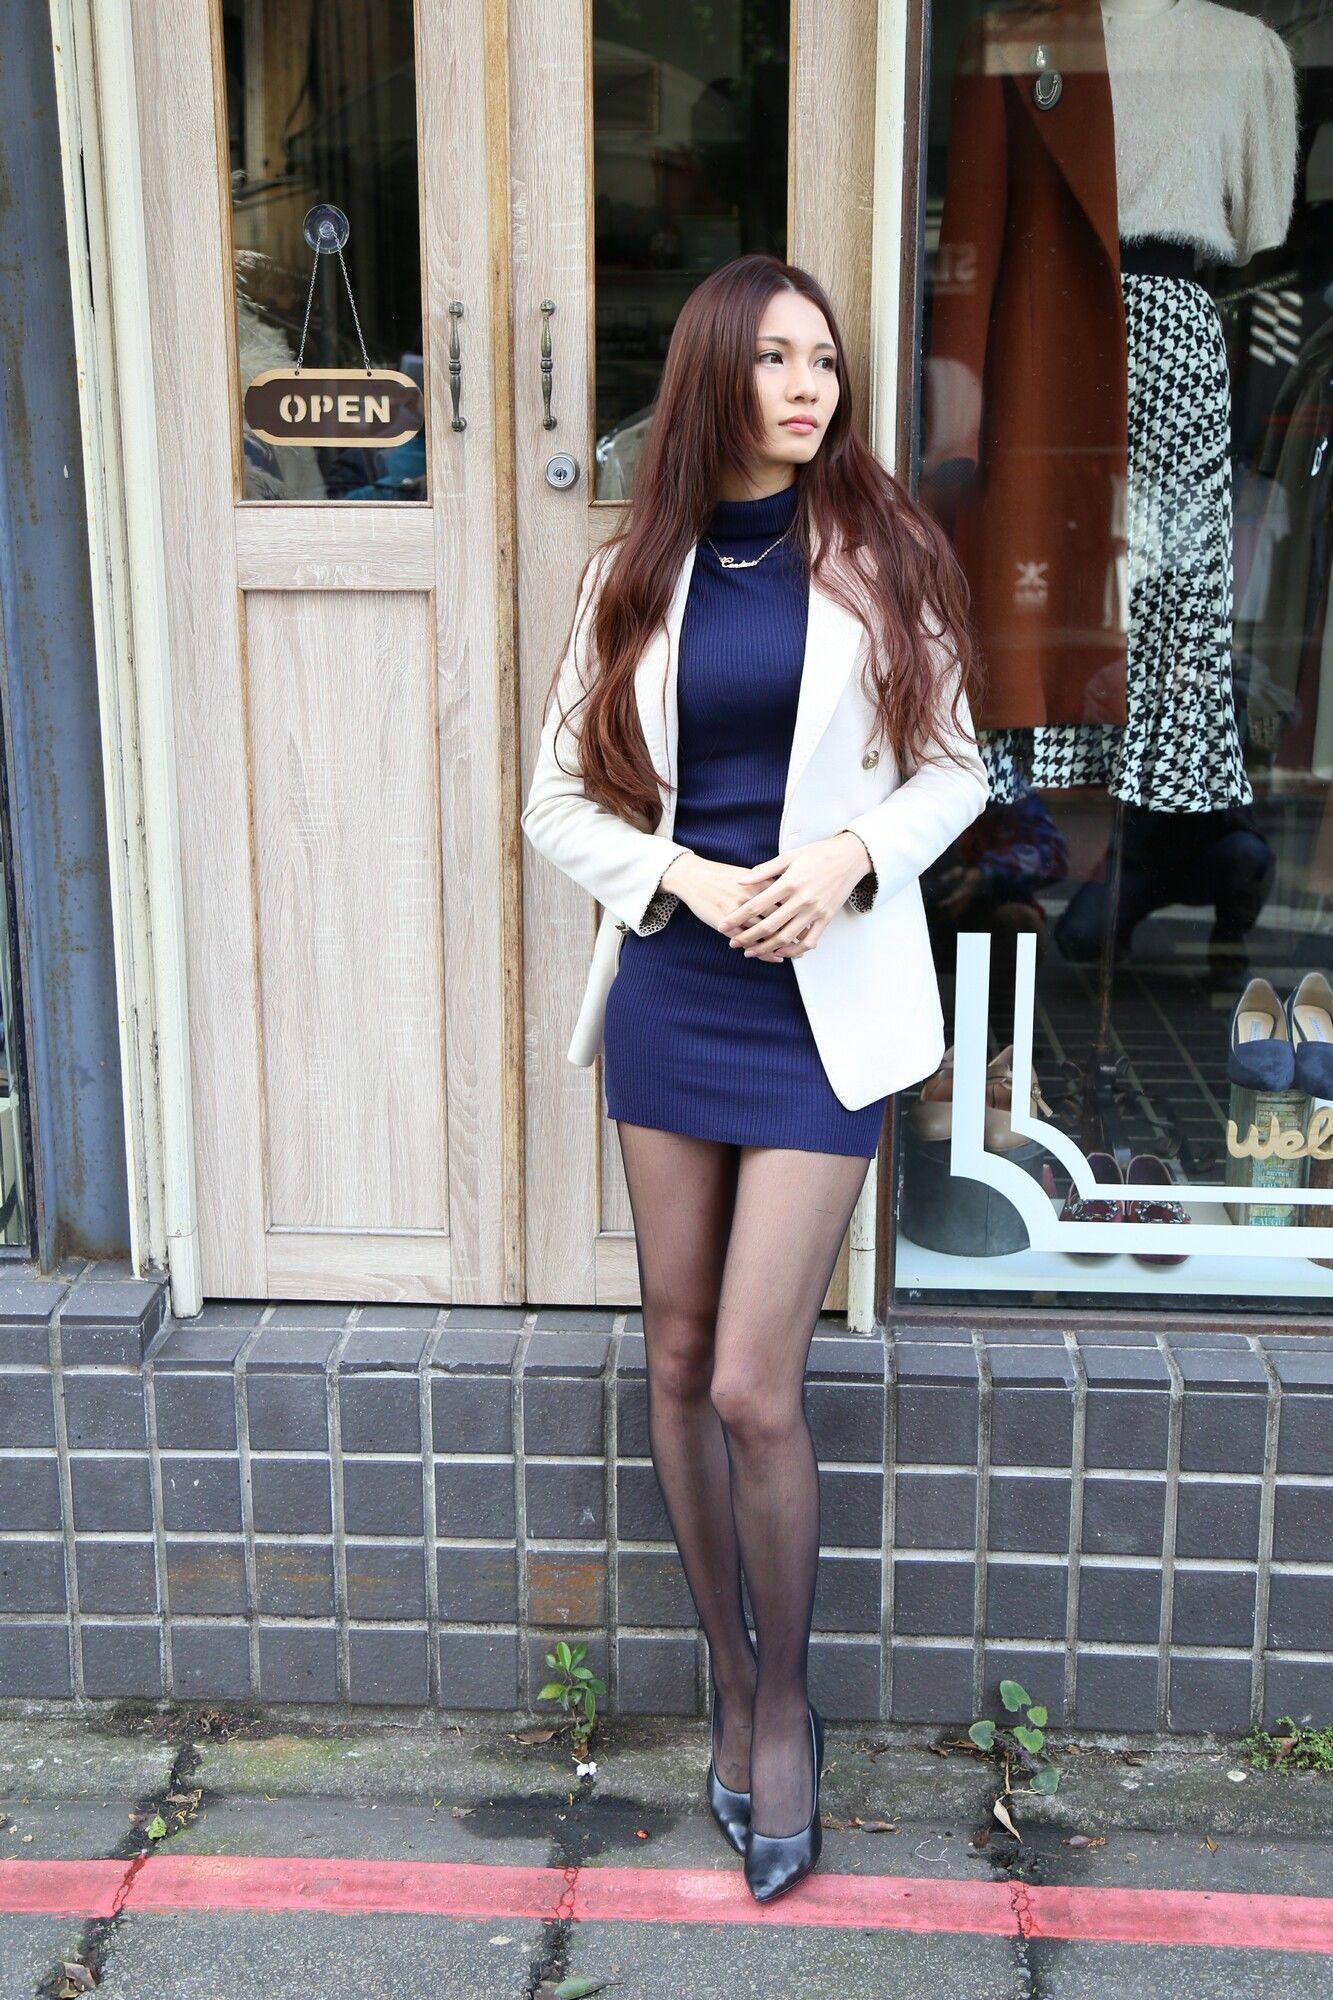 VOL.366 [台湾正妹]丝袜美腿黑丝西装美女街拍美腿:蔡译心(Candice)超高清个人性感漂亮大图(120P)